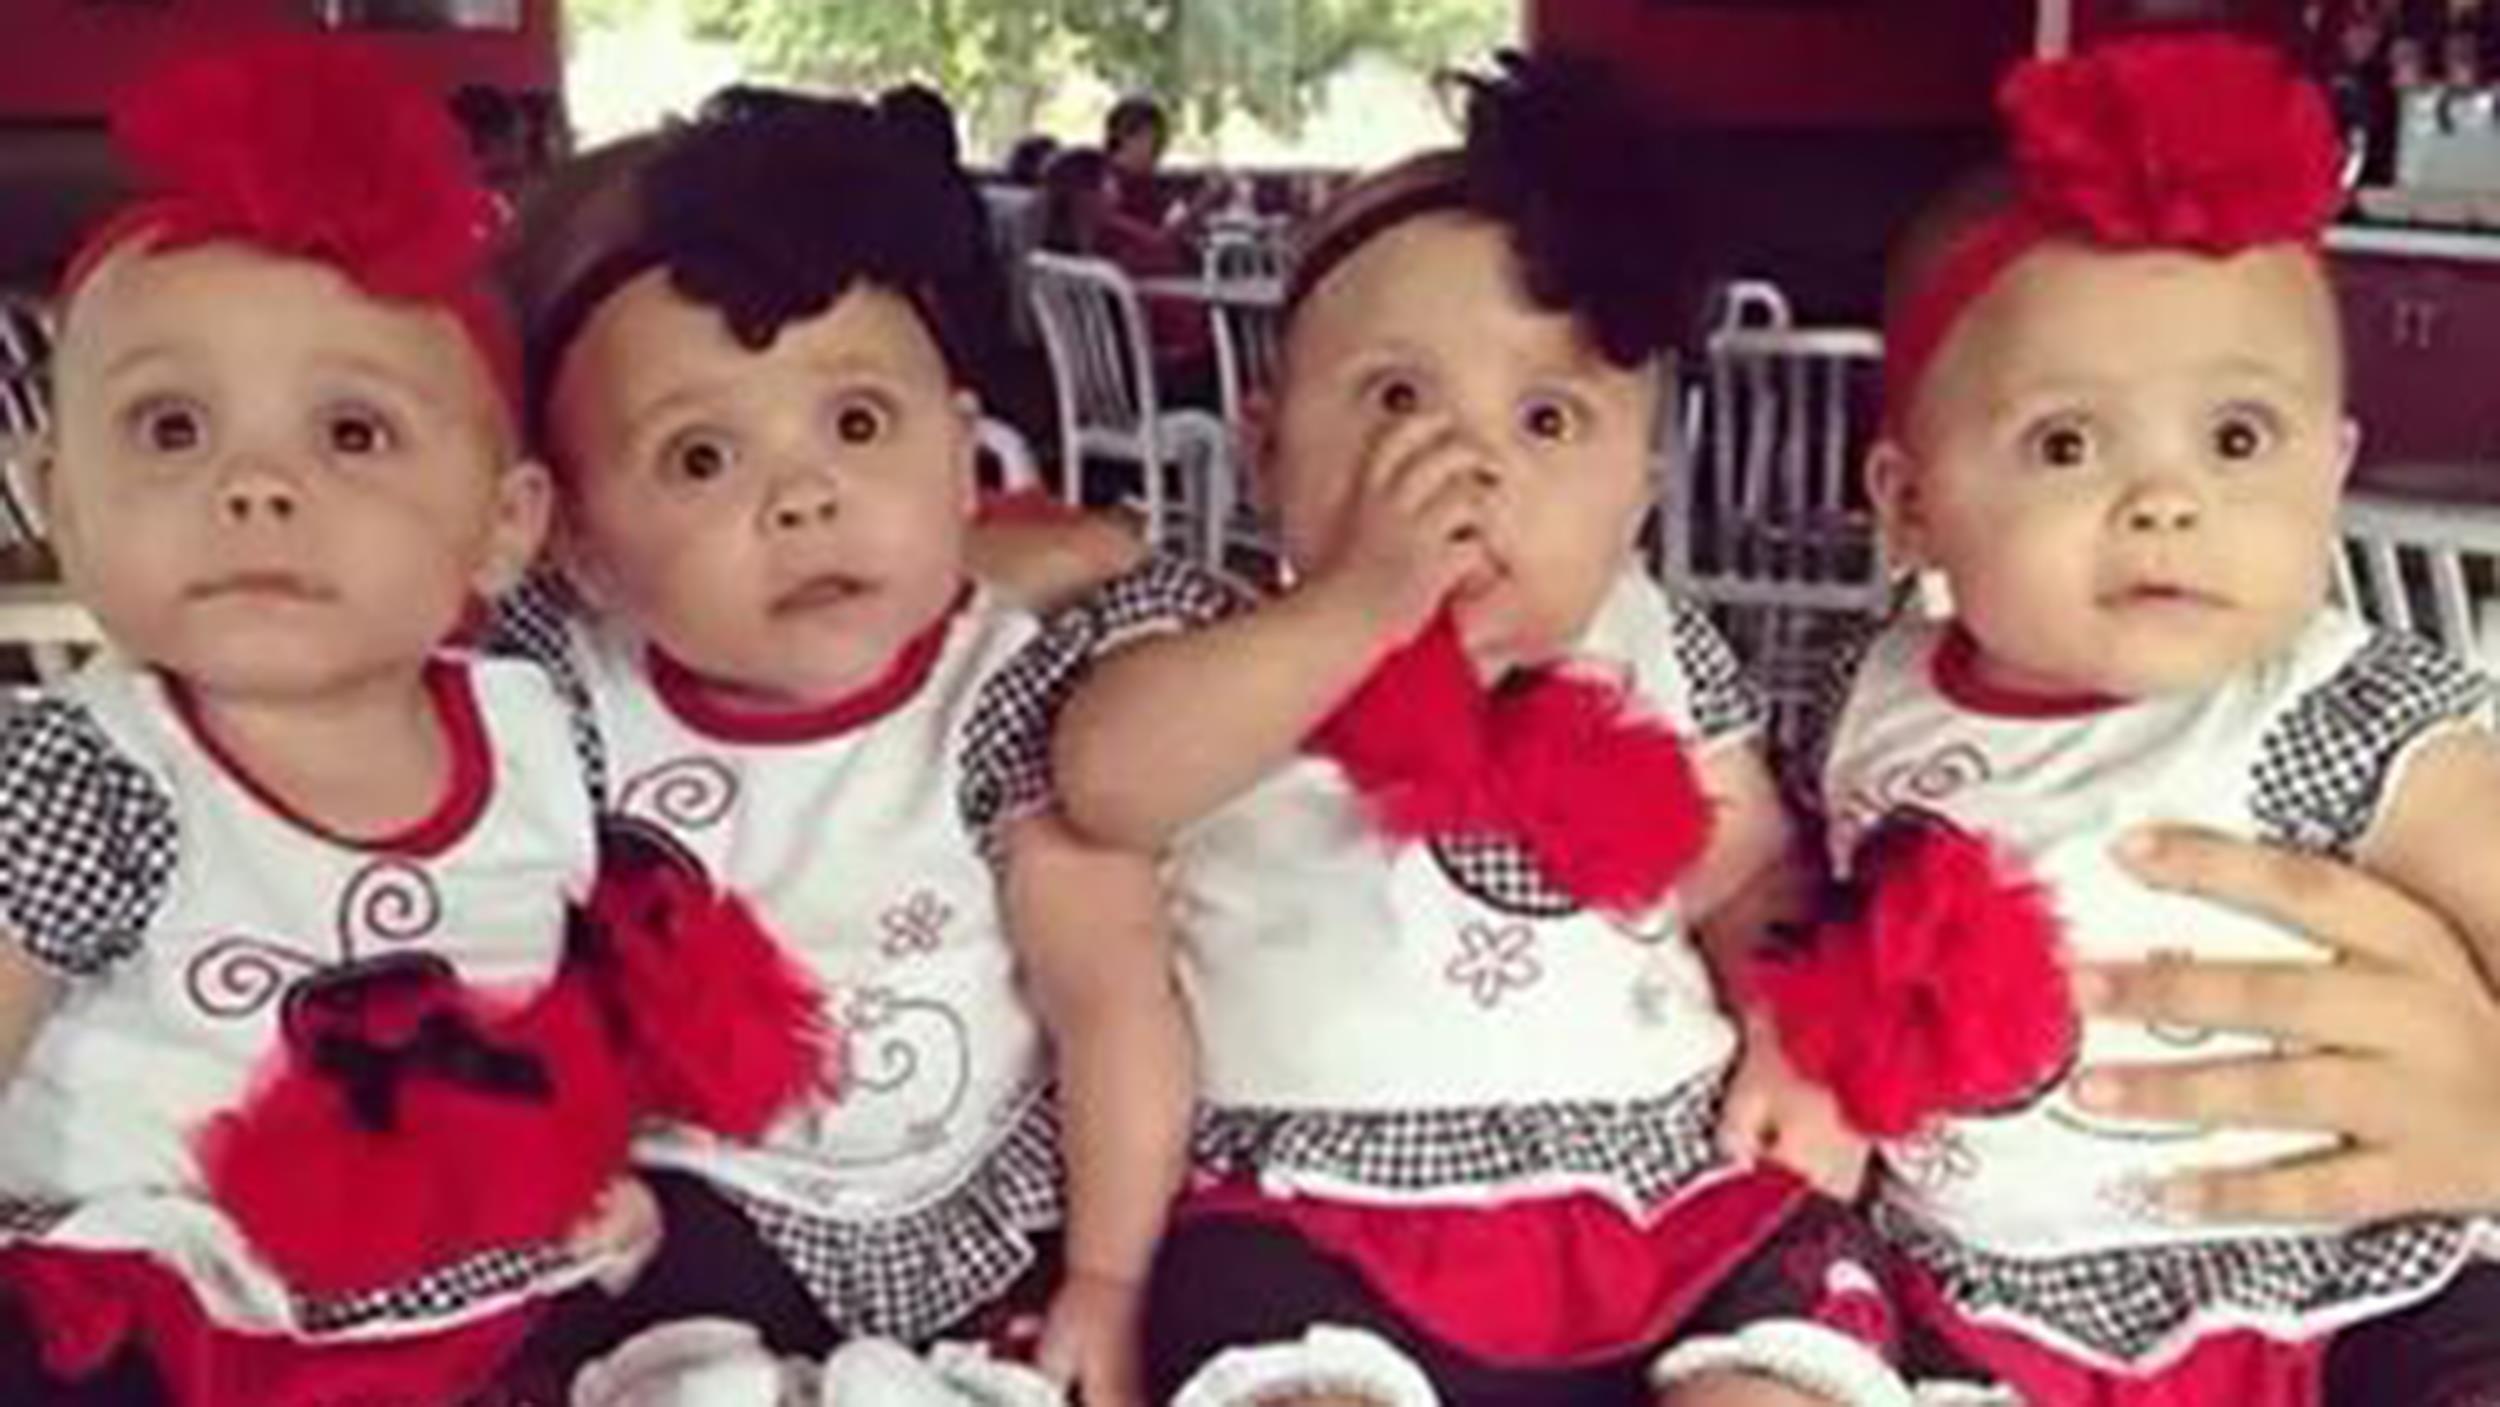 health mother expecting triplets delivers surprise quadruplets